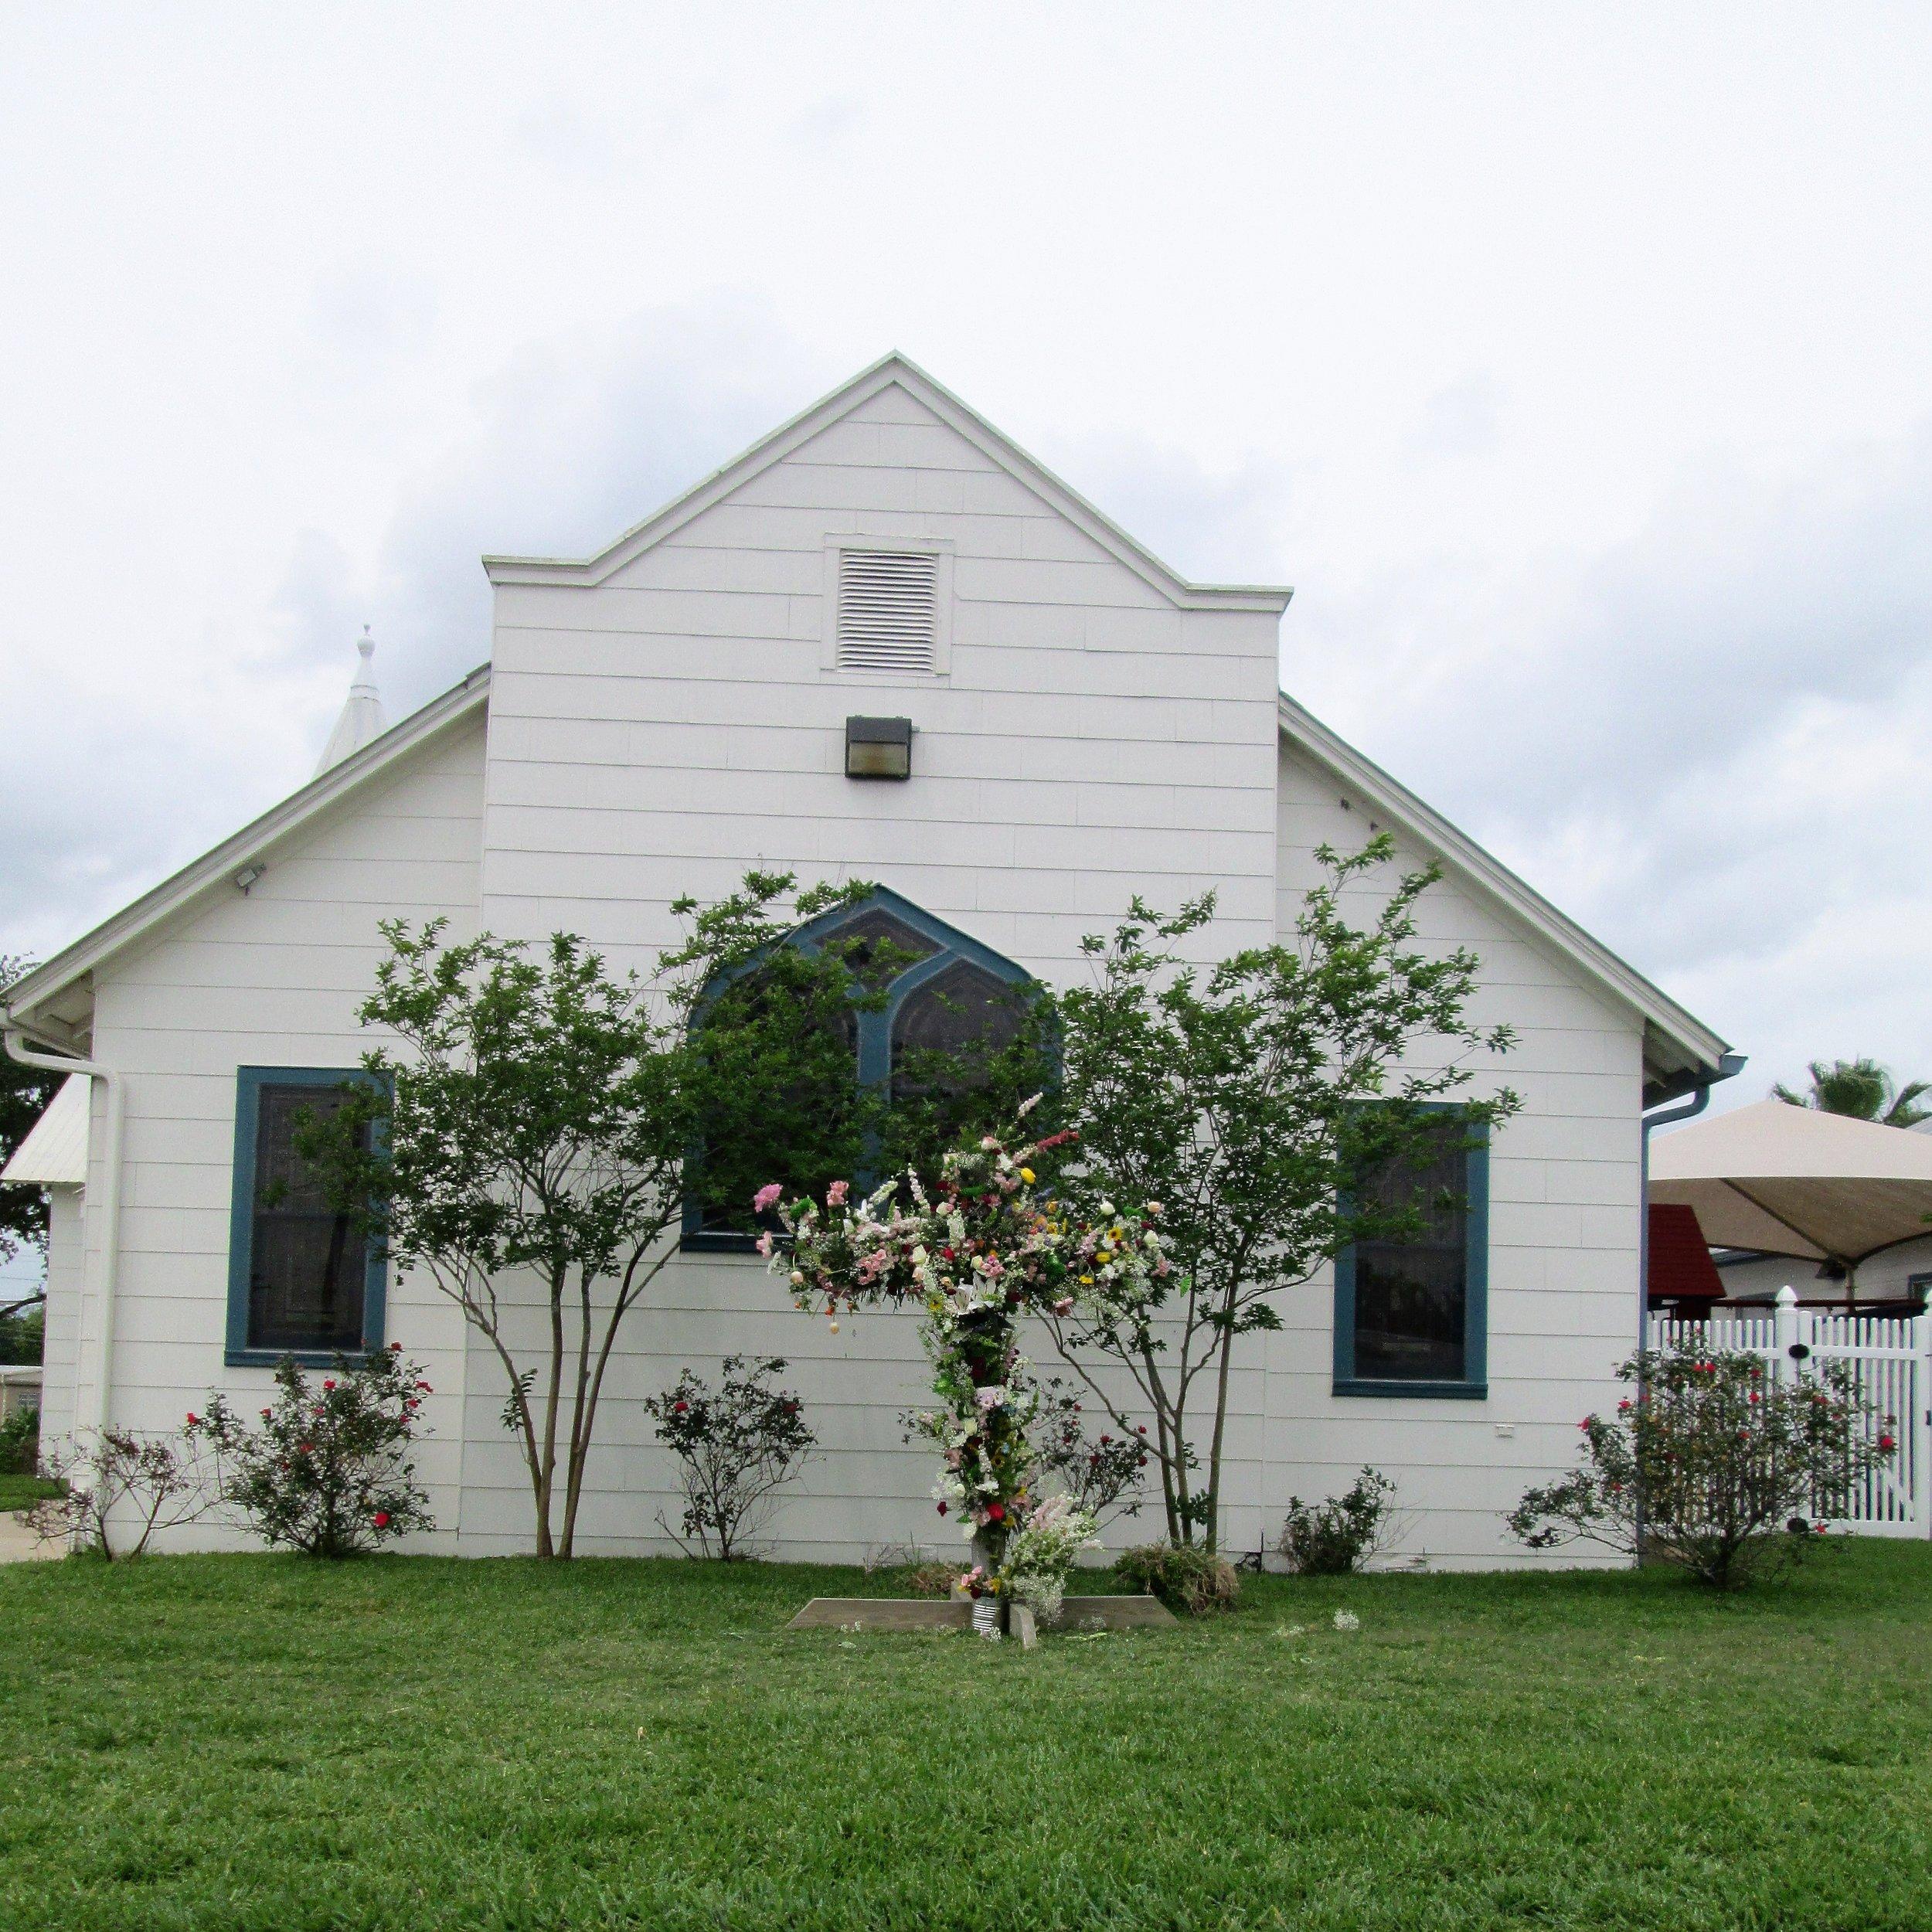 The Original Church Building April 16, 2017